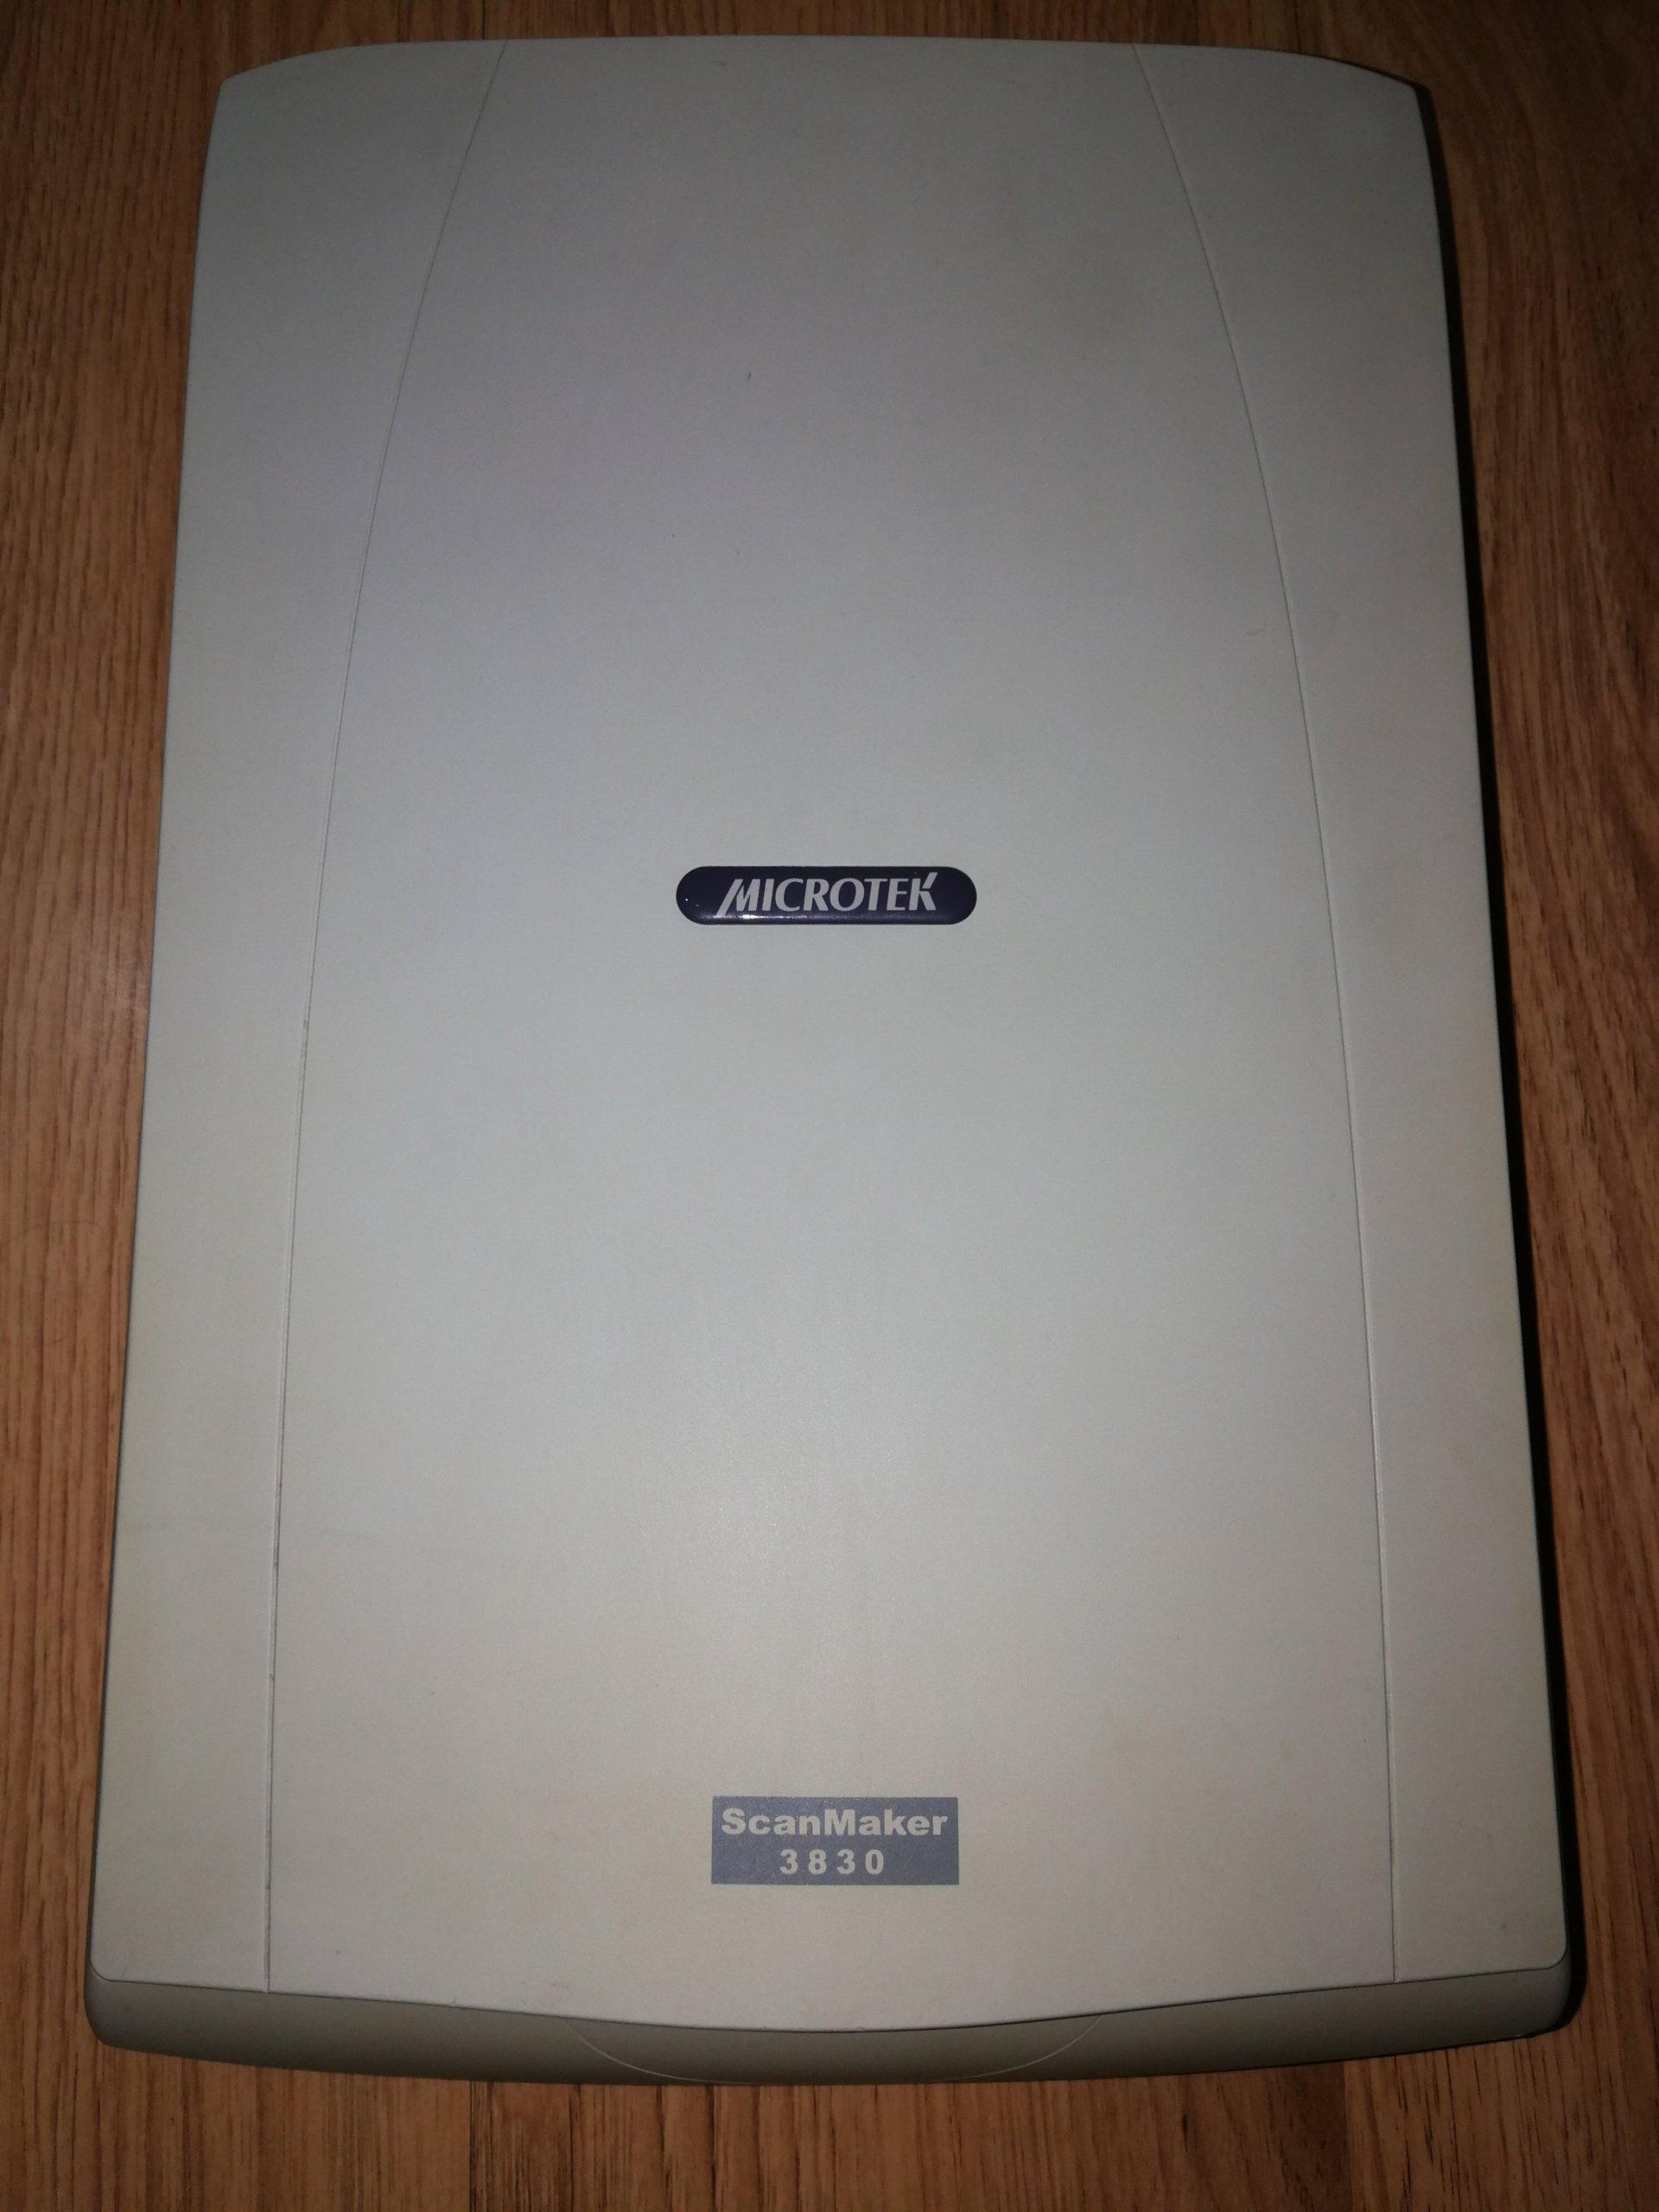 MICROTEK SCANMAKER 3830 WINDOWS 8 X64 TREIBER